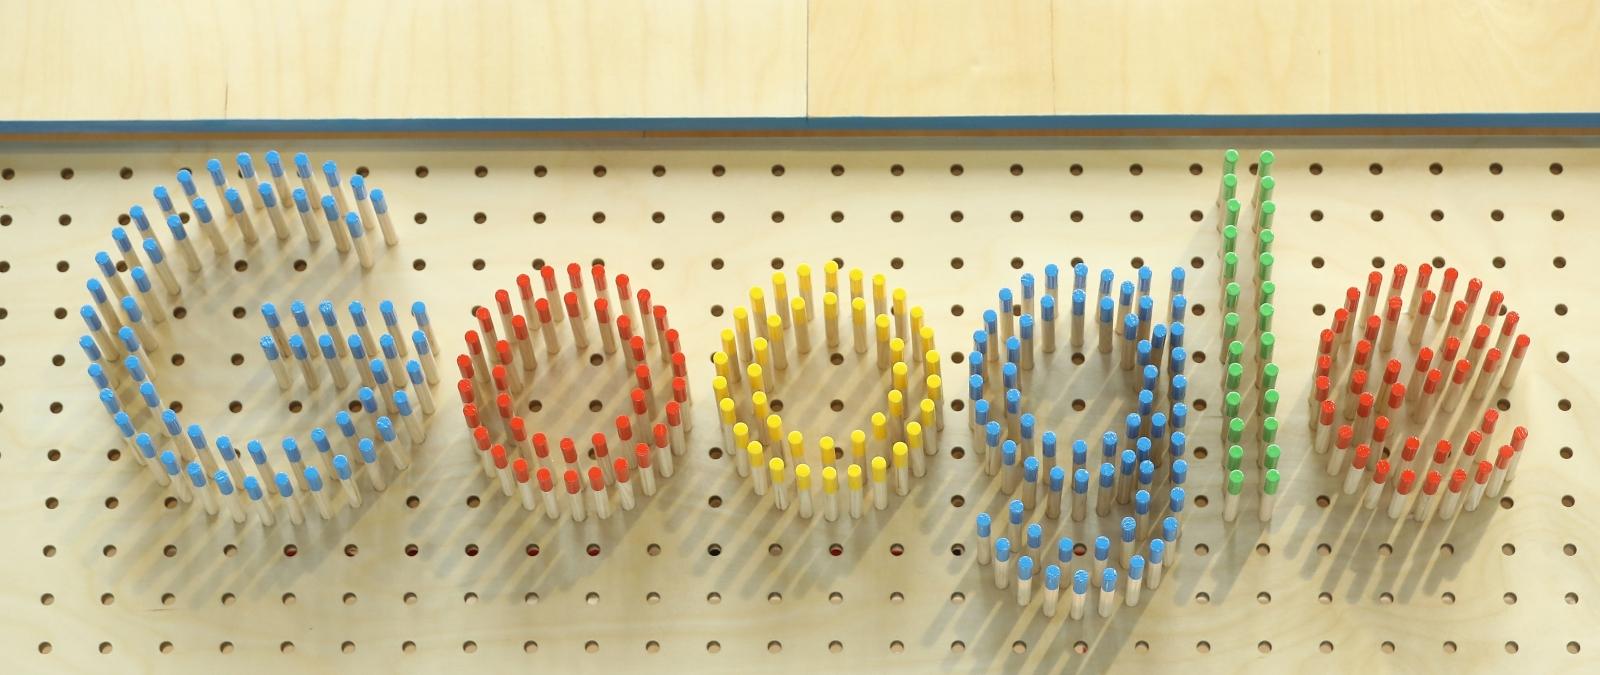 Google may face hefty fine over shoppingservice